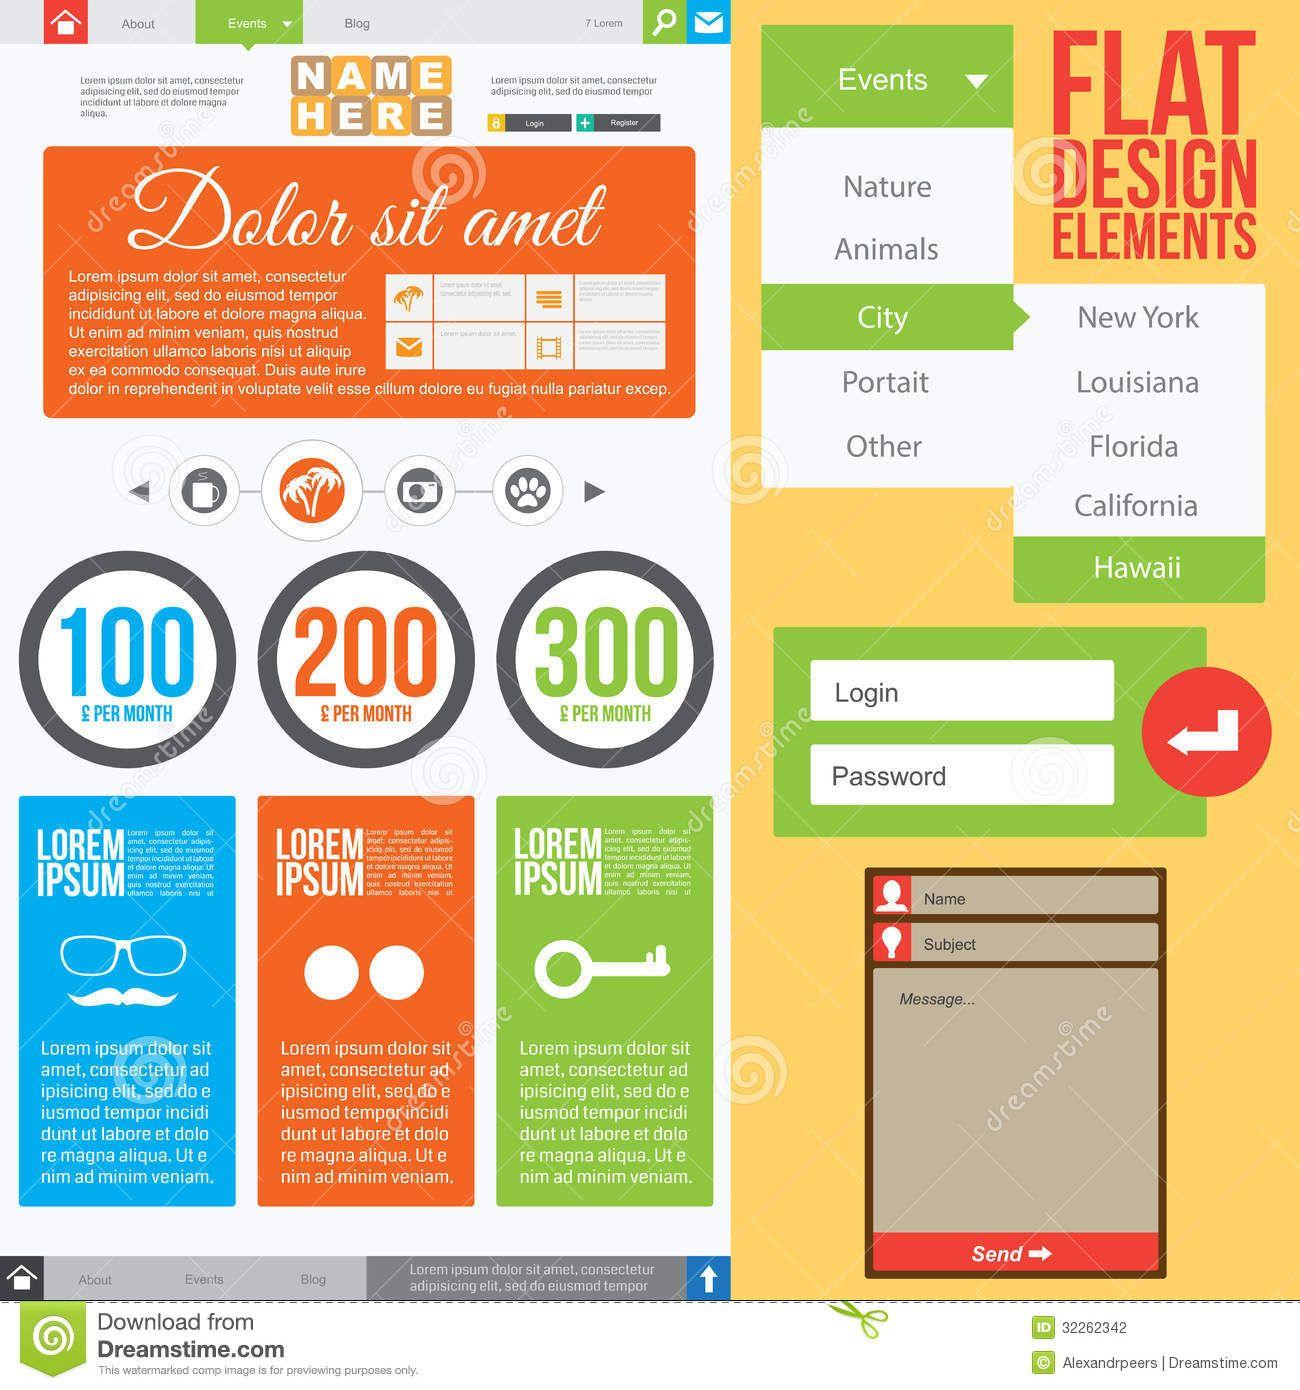 Design elements banner - Web Design Elements Flat Design Google Search